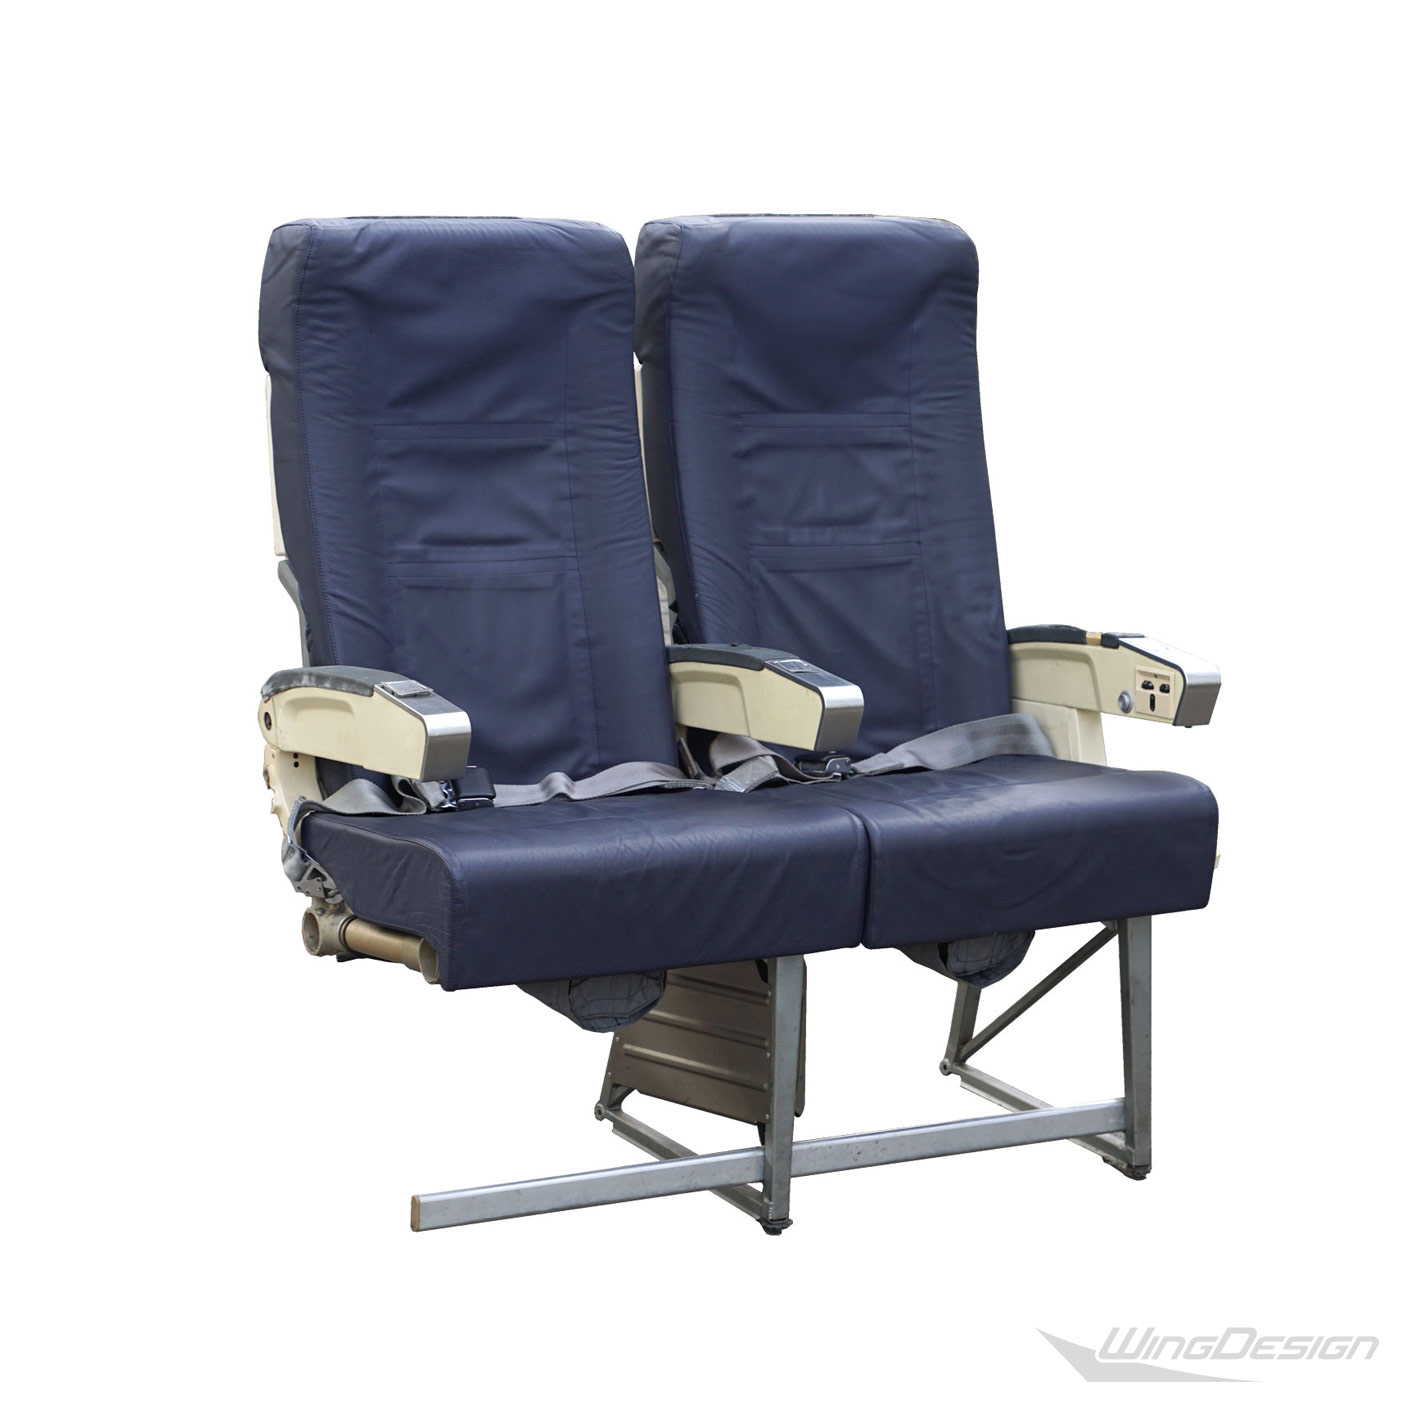 Flugzeugsitz Doppelbank blau Leder gebraucht EconomyClass Aircraftseat wingdesign.com